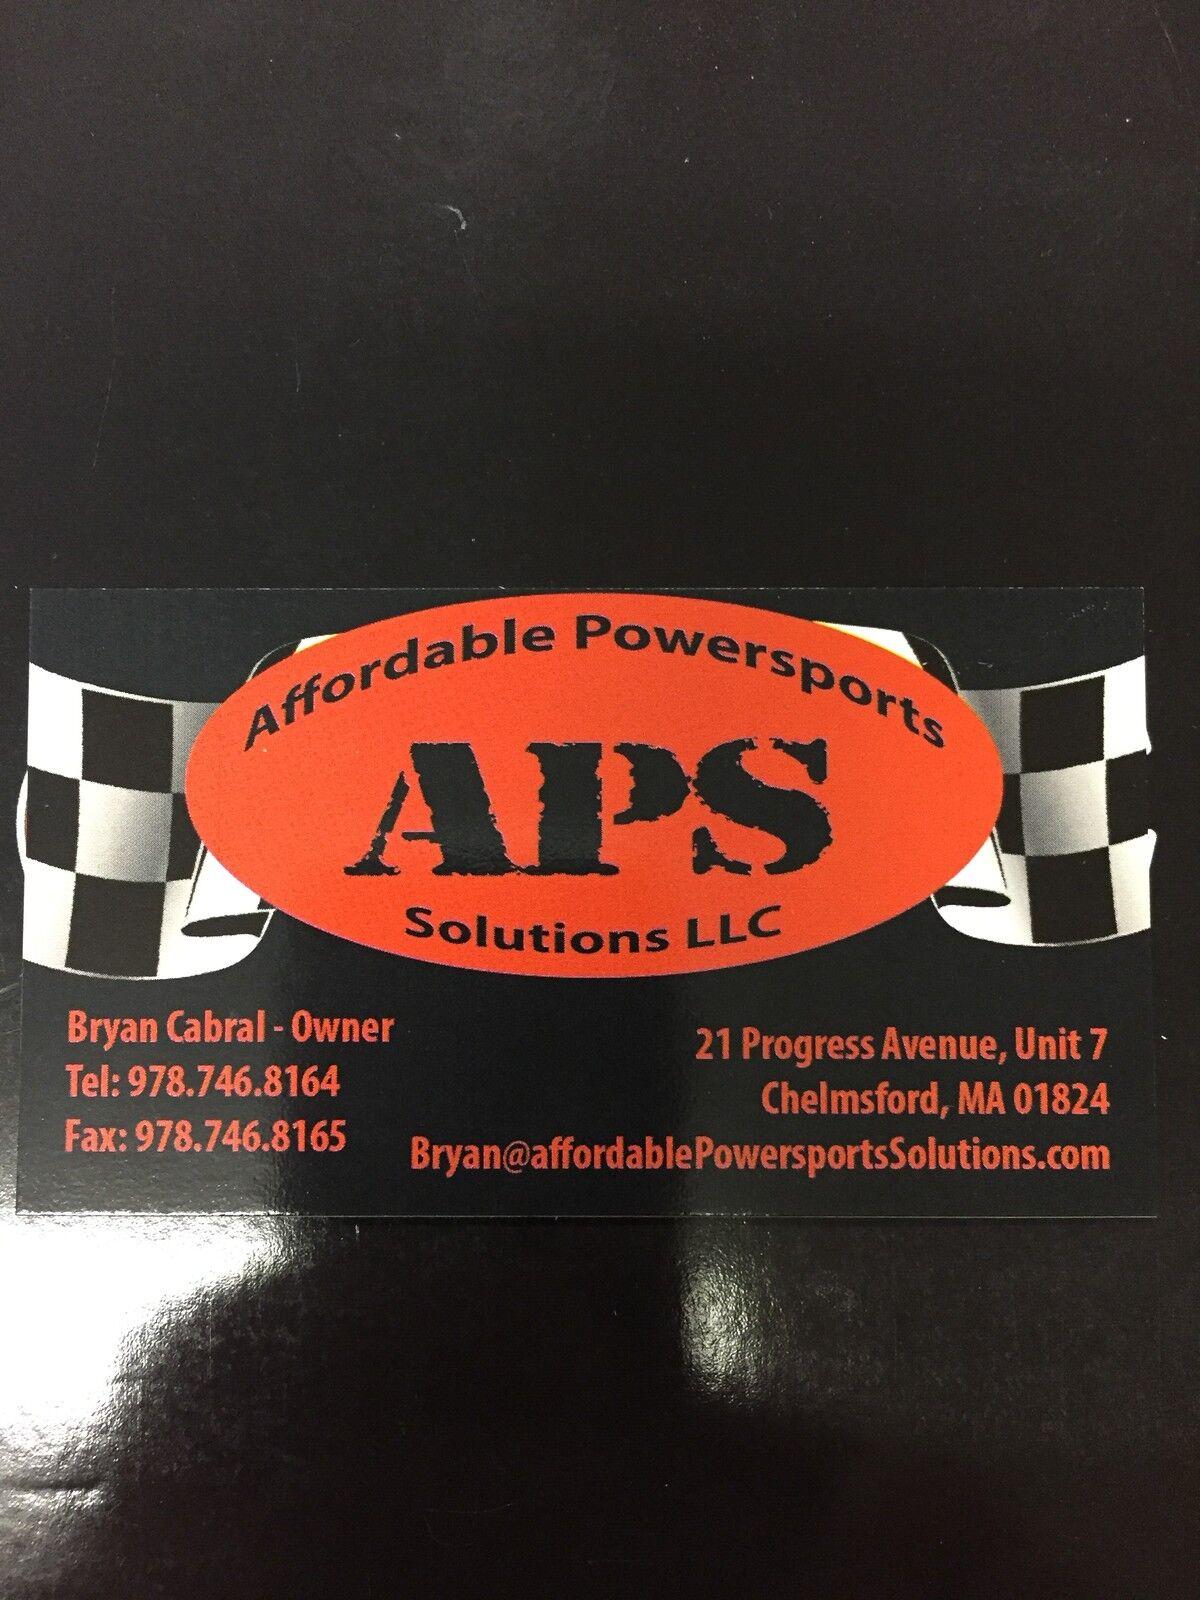 affordablepowersportssolutions